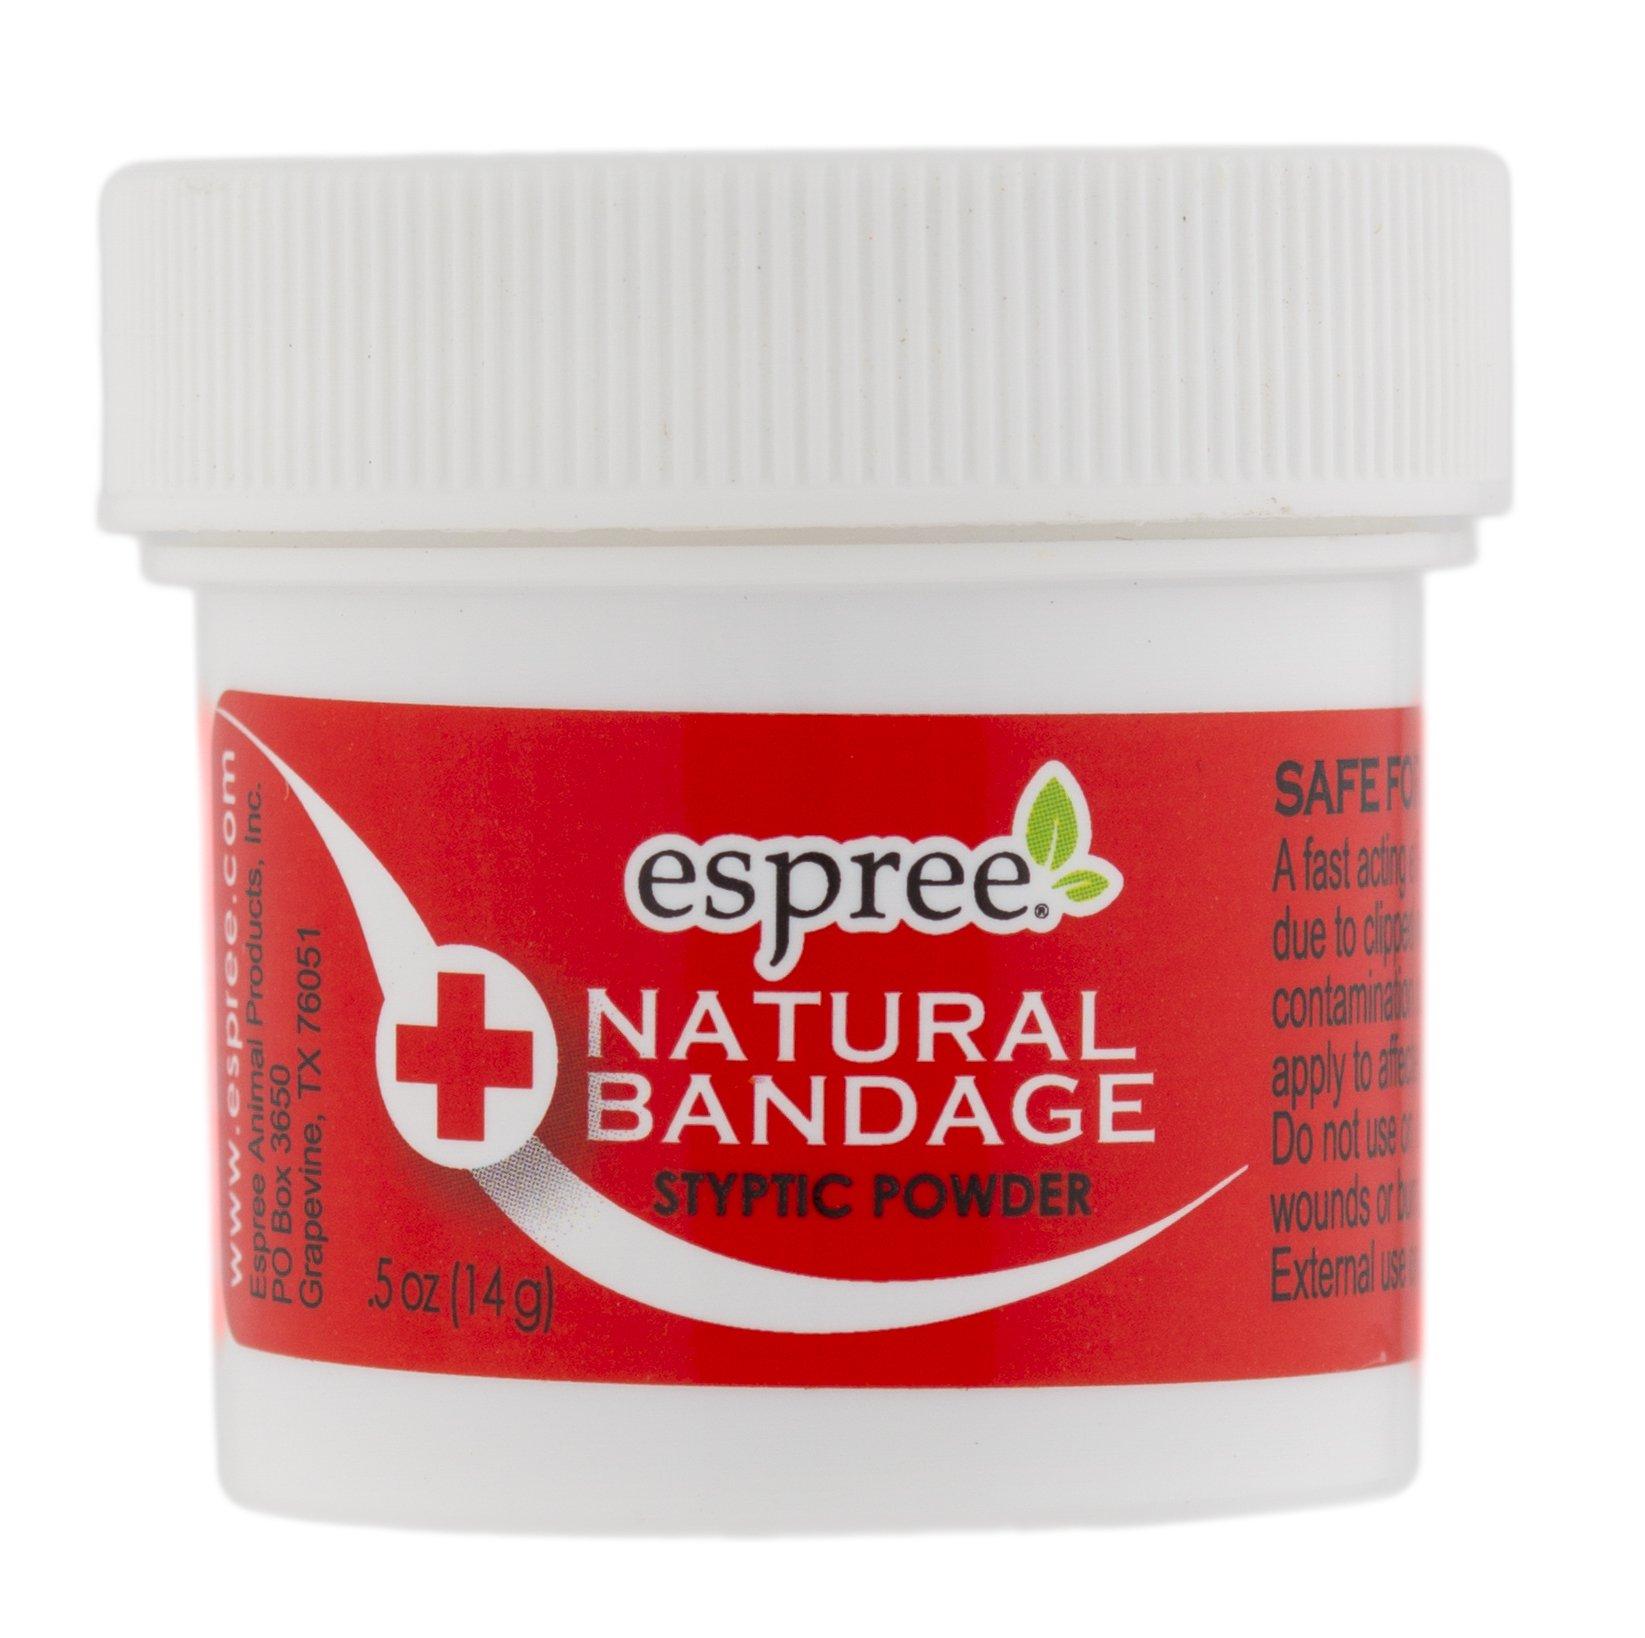 Espree Natural Bandage Styptic Powder, 0.5 oz by Espree